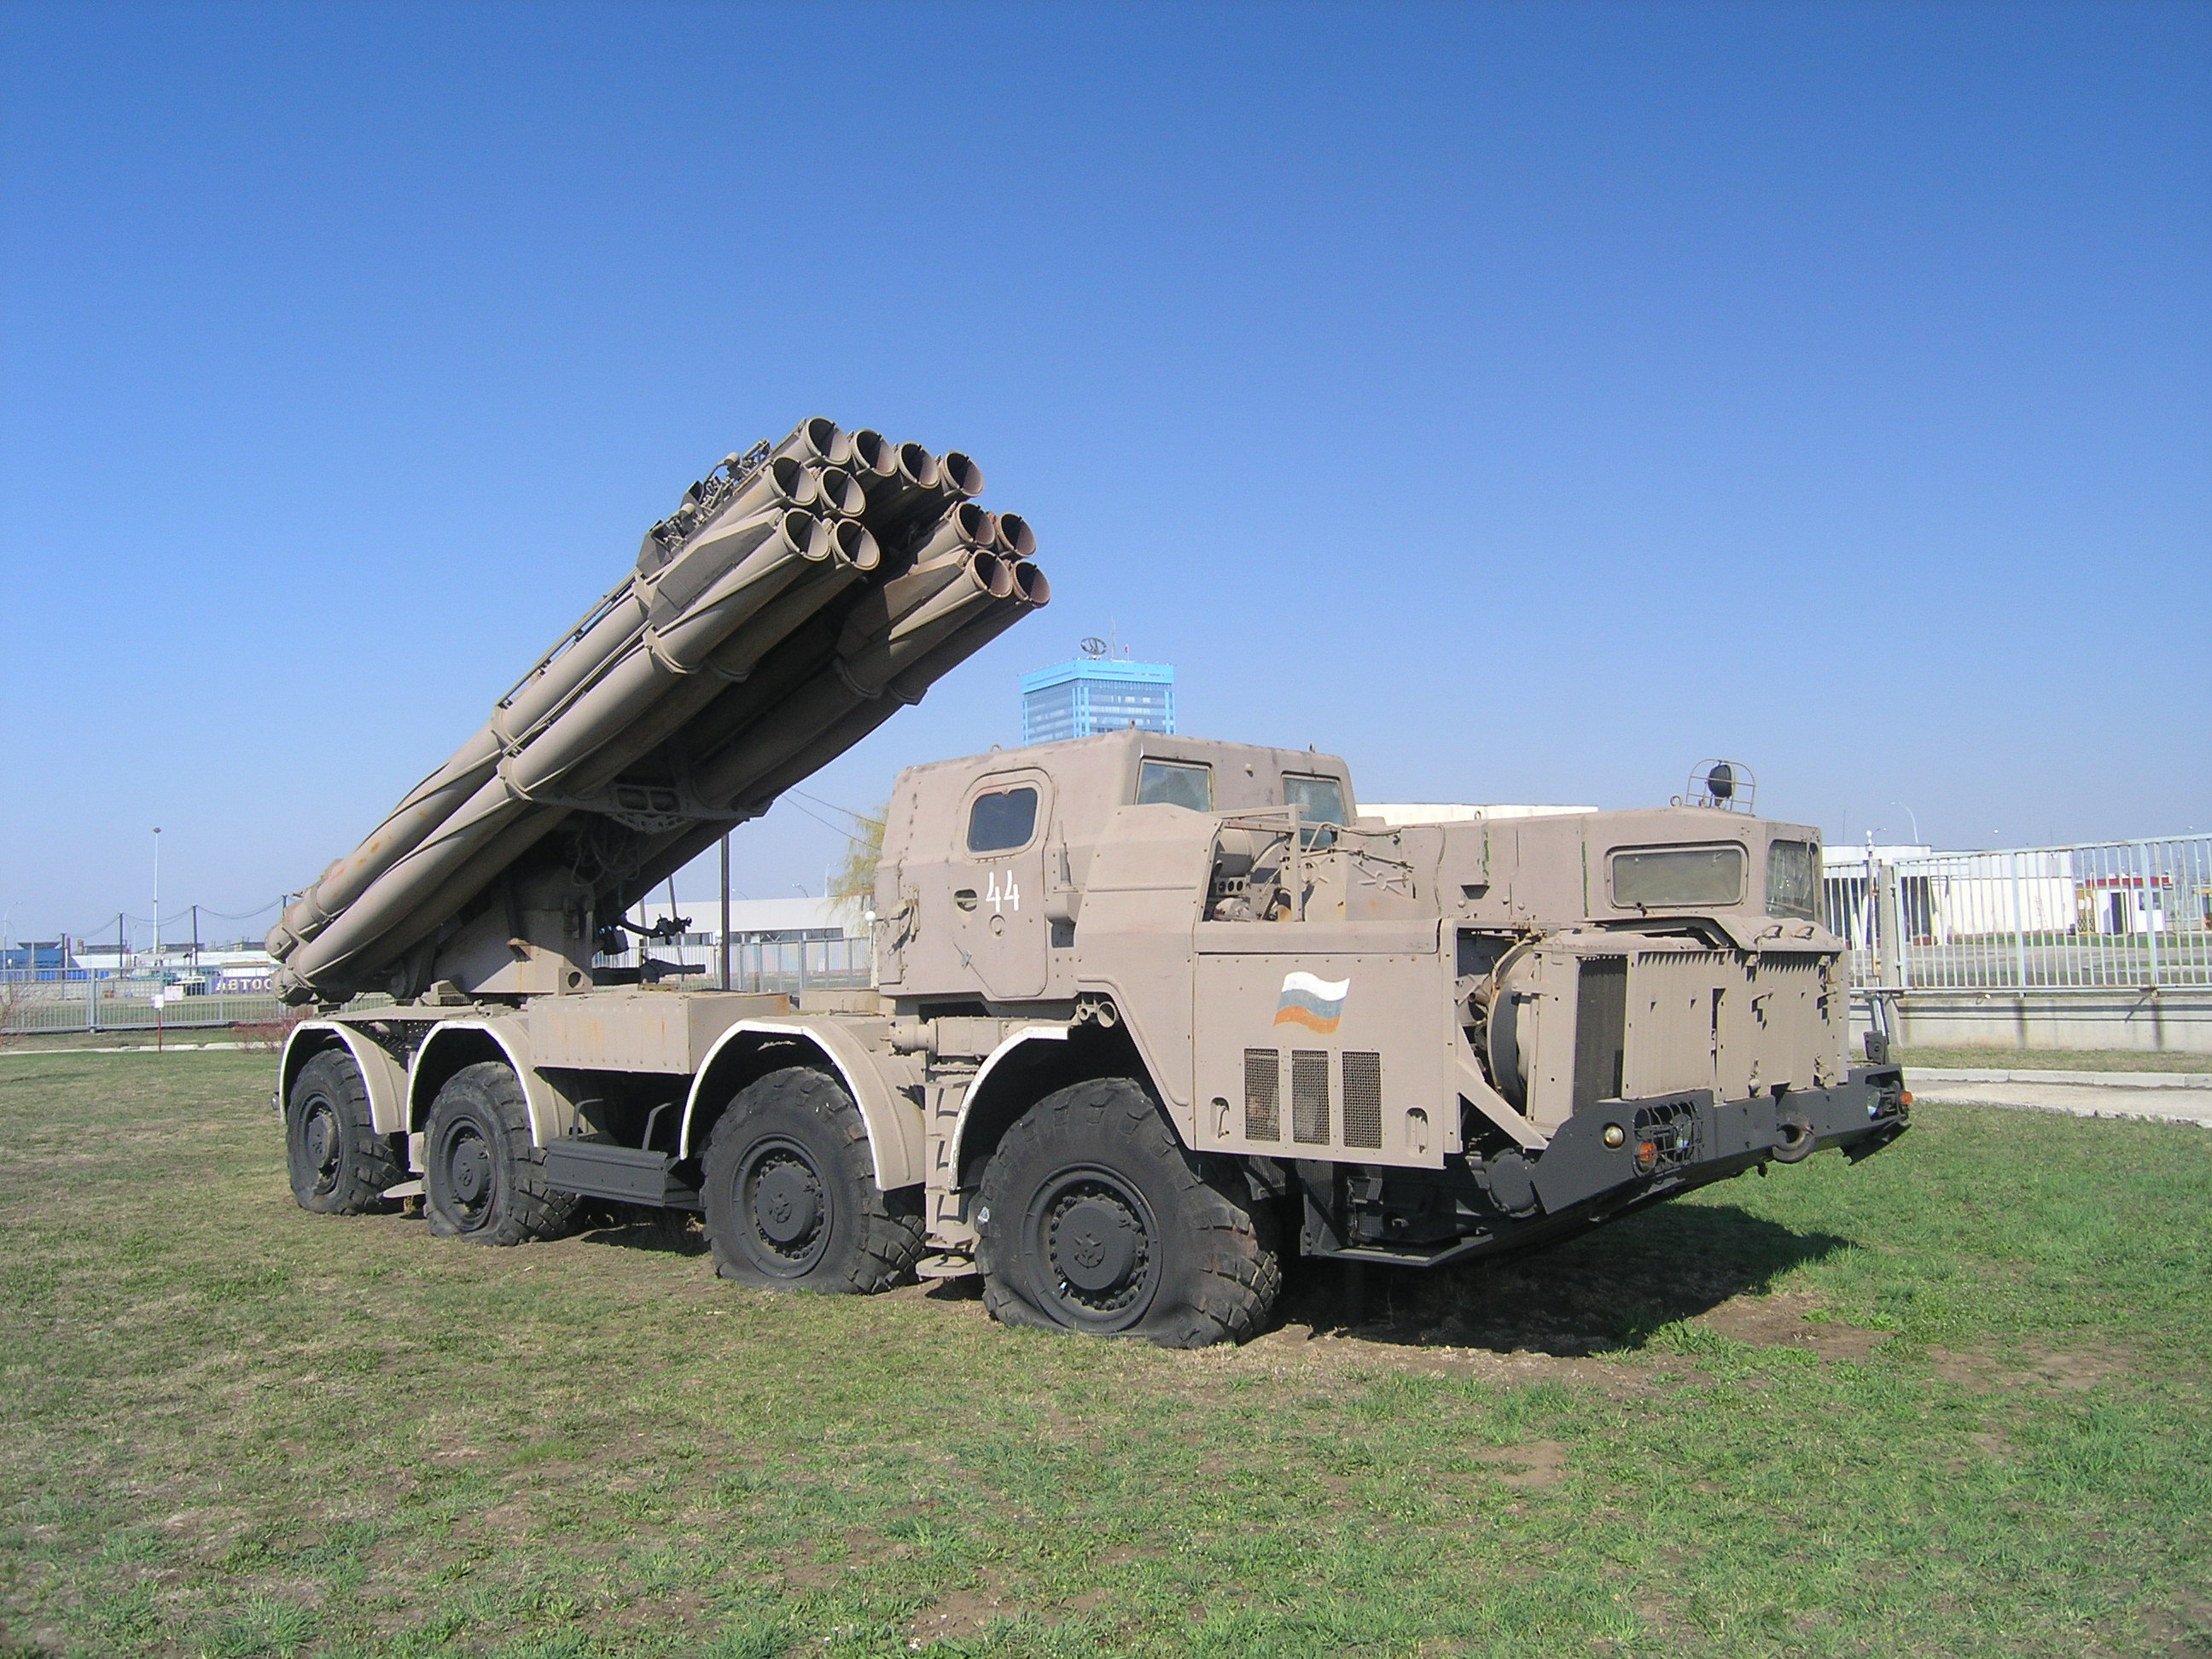 BM-30_Smerch-5175.JPG